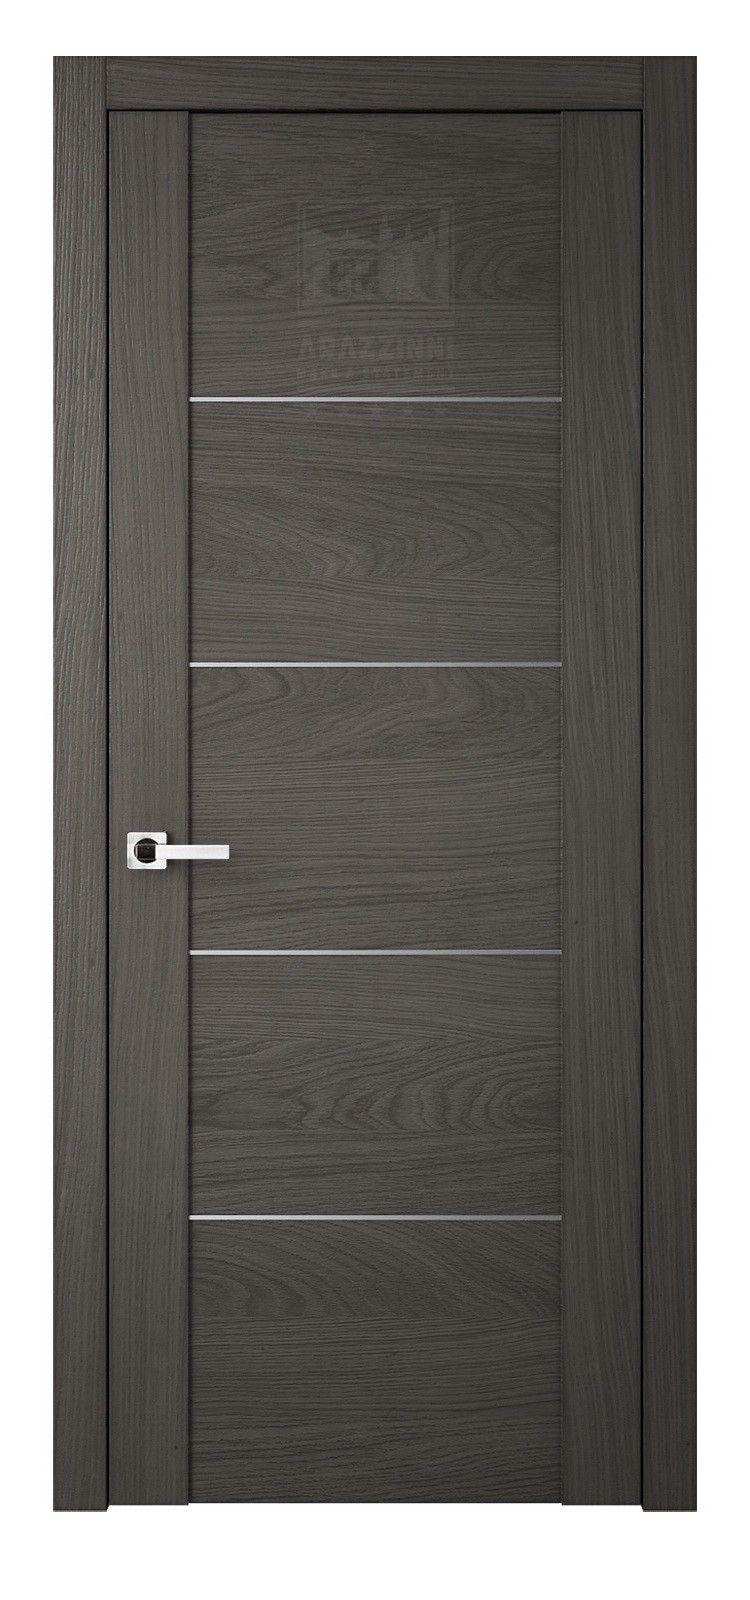 Arazzinni quadro q interior door ash oak Двери pinterest